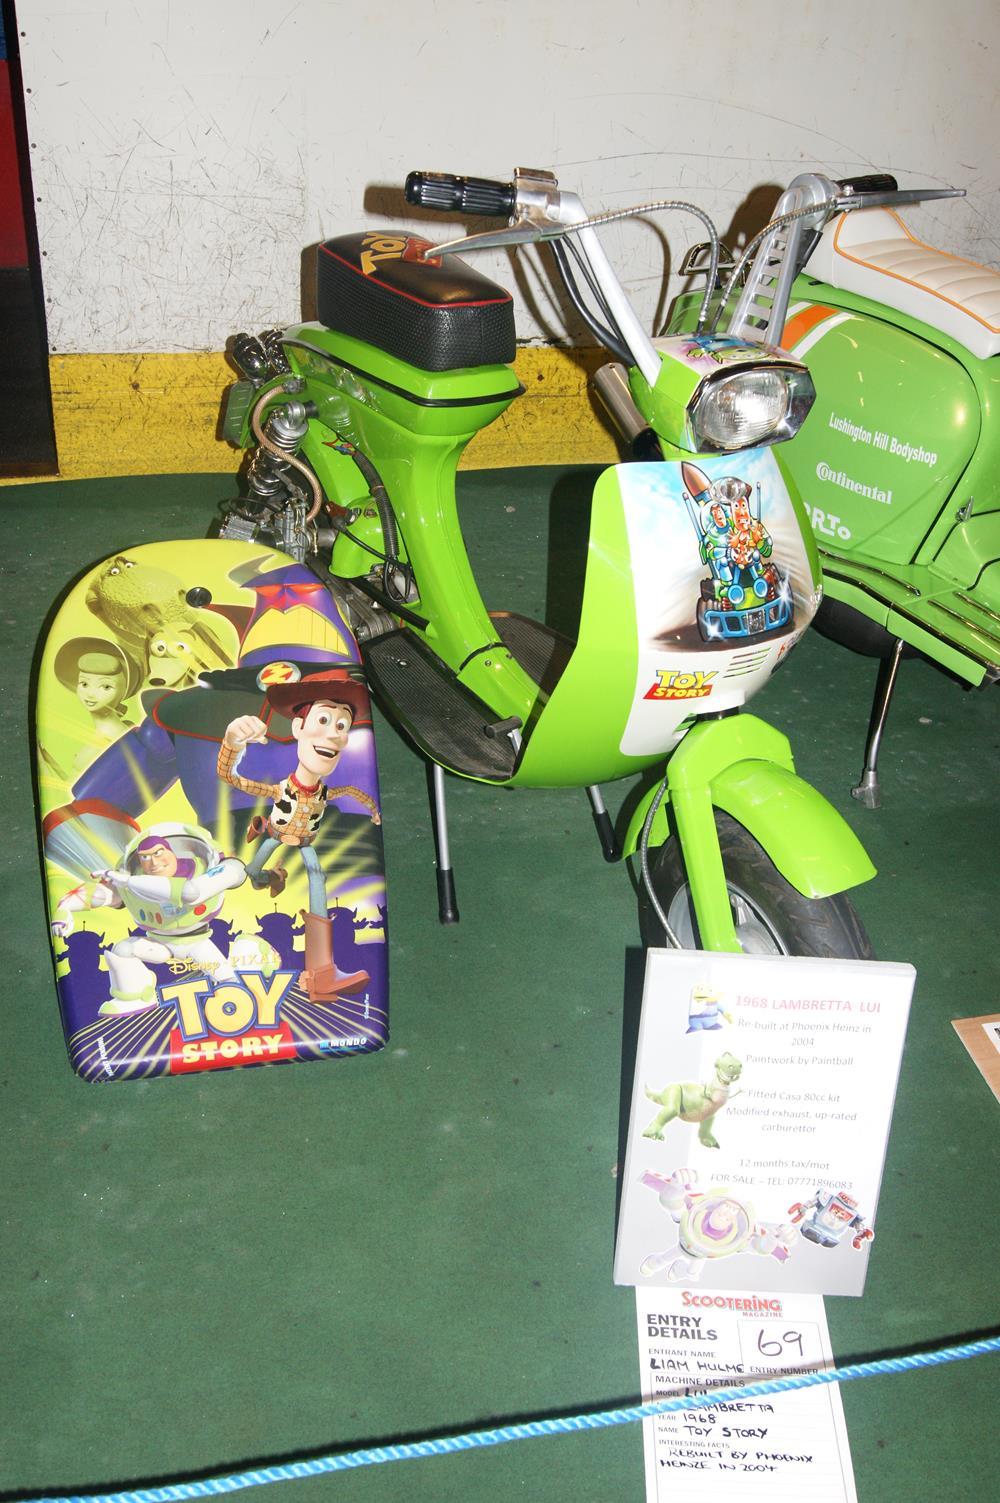 Toy Story themed custom Vega scooter